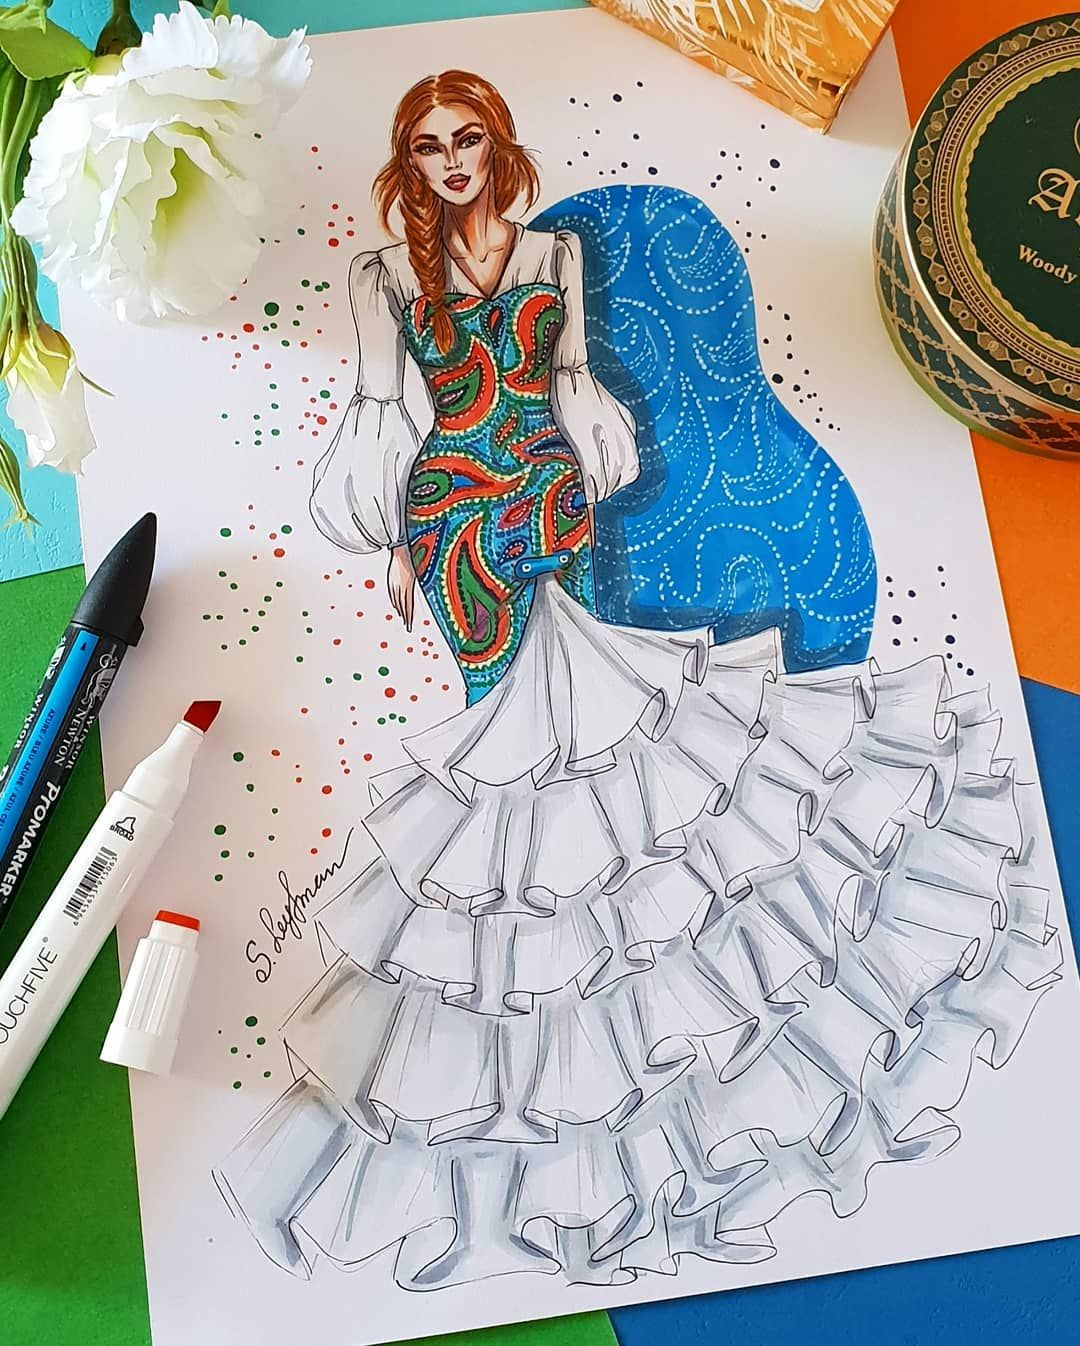 Fashionartist Fashiondesigner Fashiondrawing Fashionillustrator Fashionsk Dress Design Sketches Fashion Illustration Dresses Illustration Fashion Design